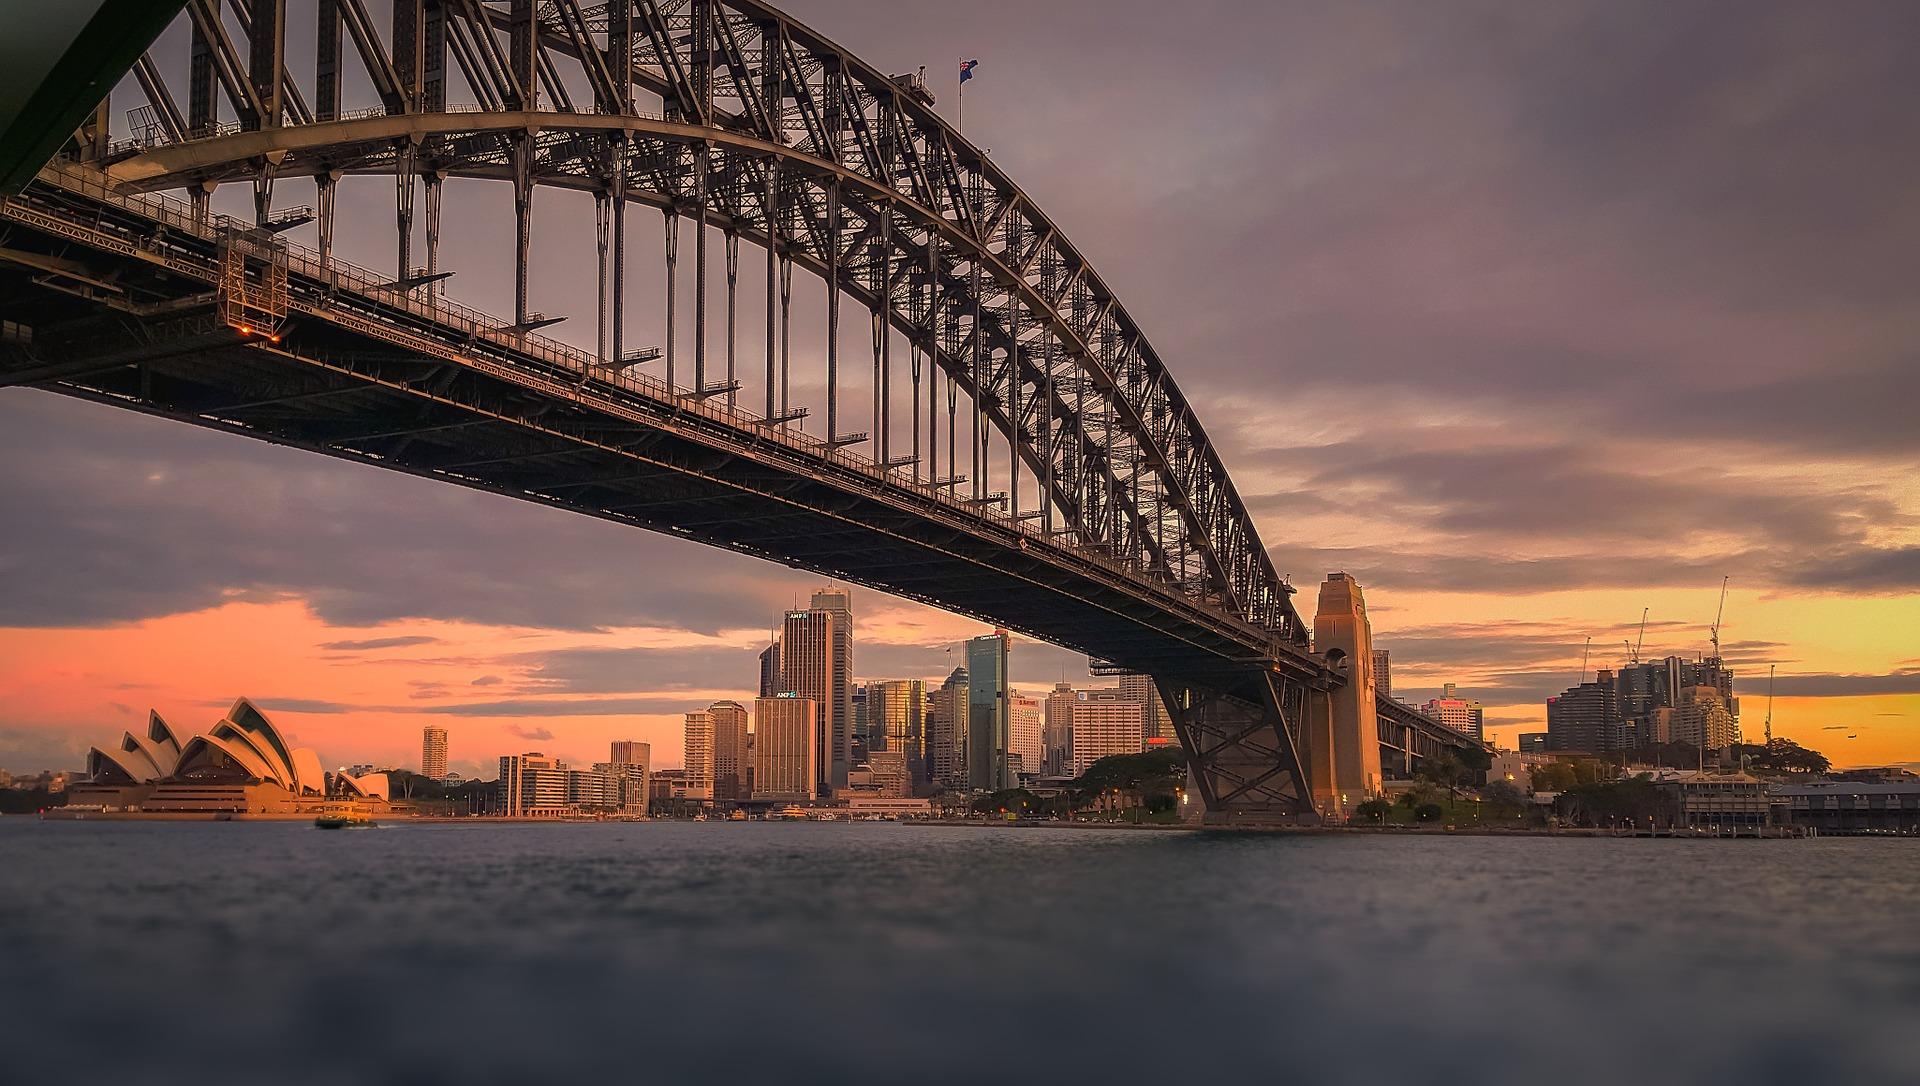 Evening on Sydney Harbour Bridge, Australia